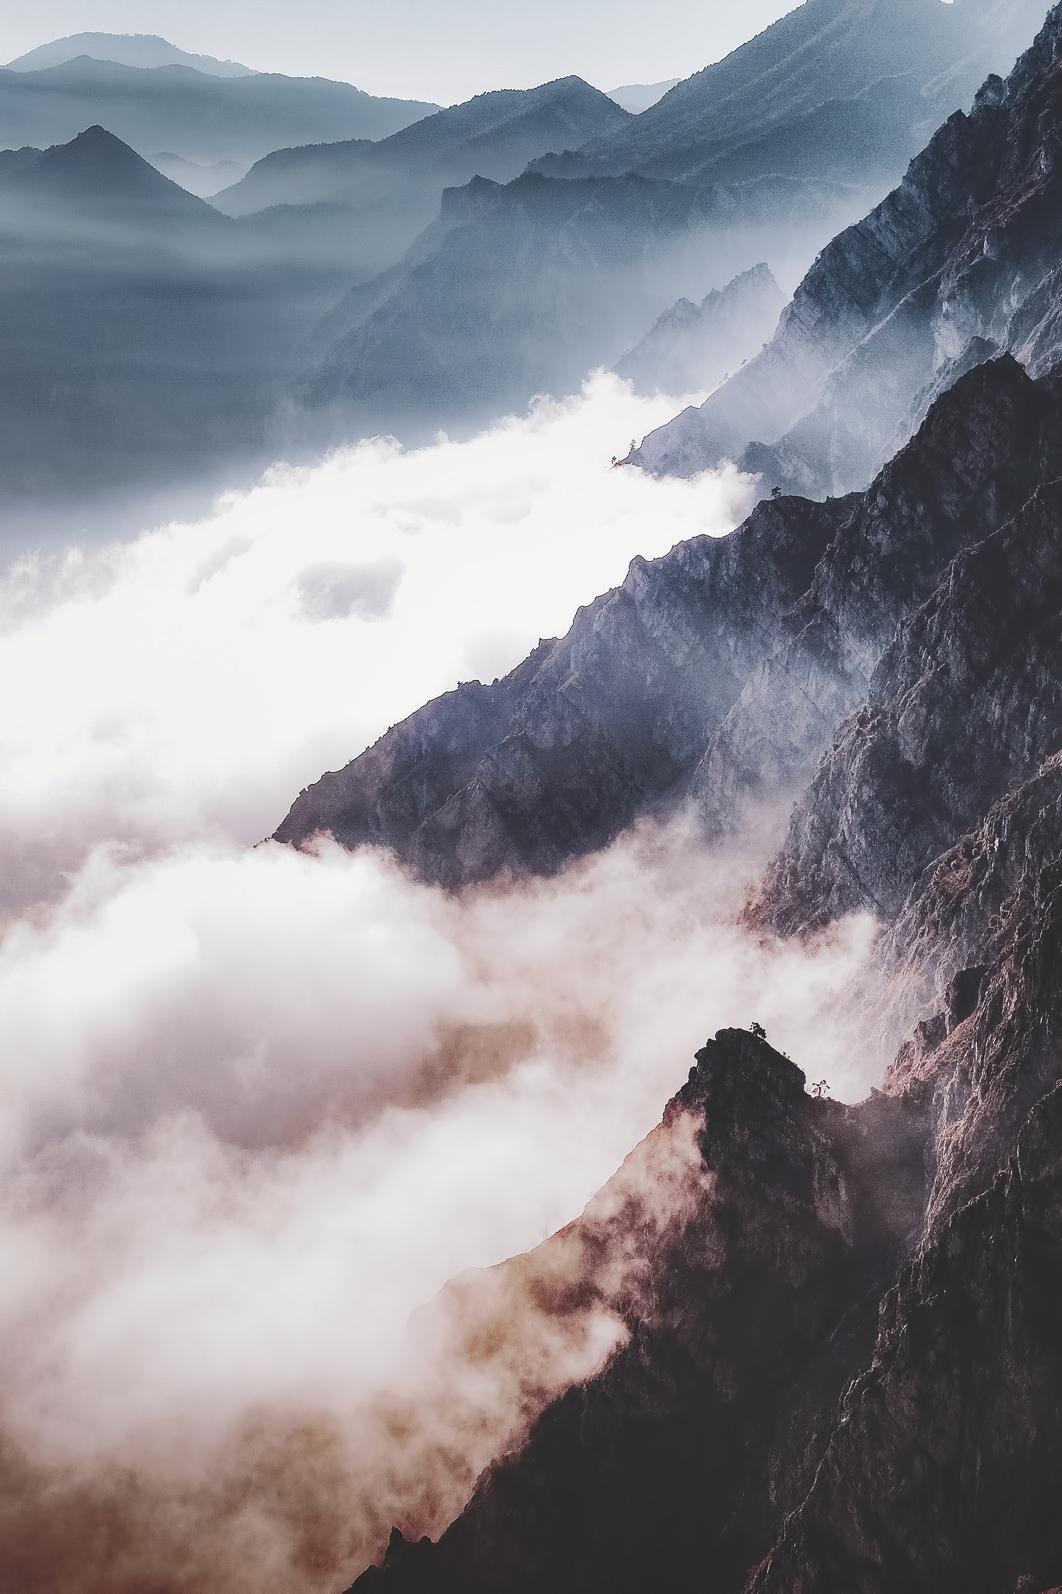 Montagne ambiance